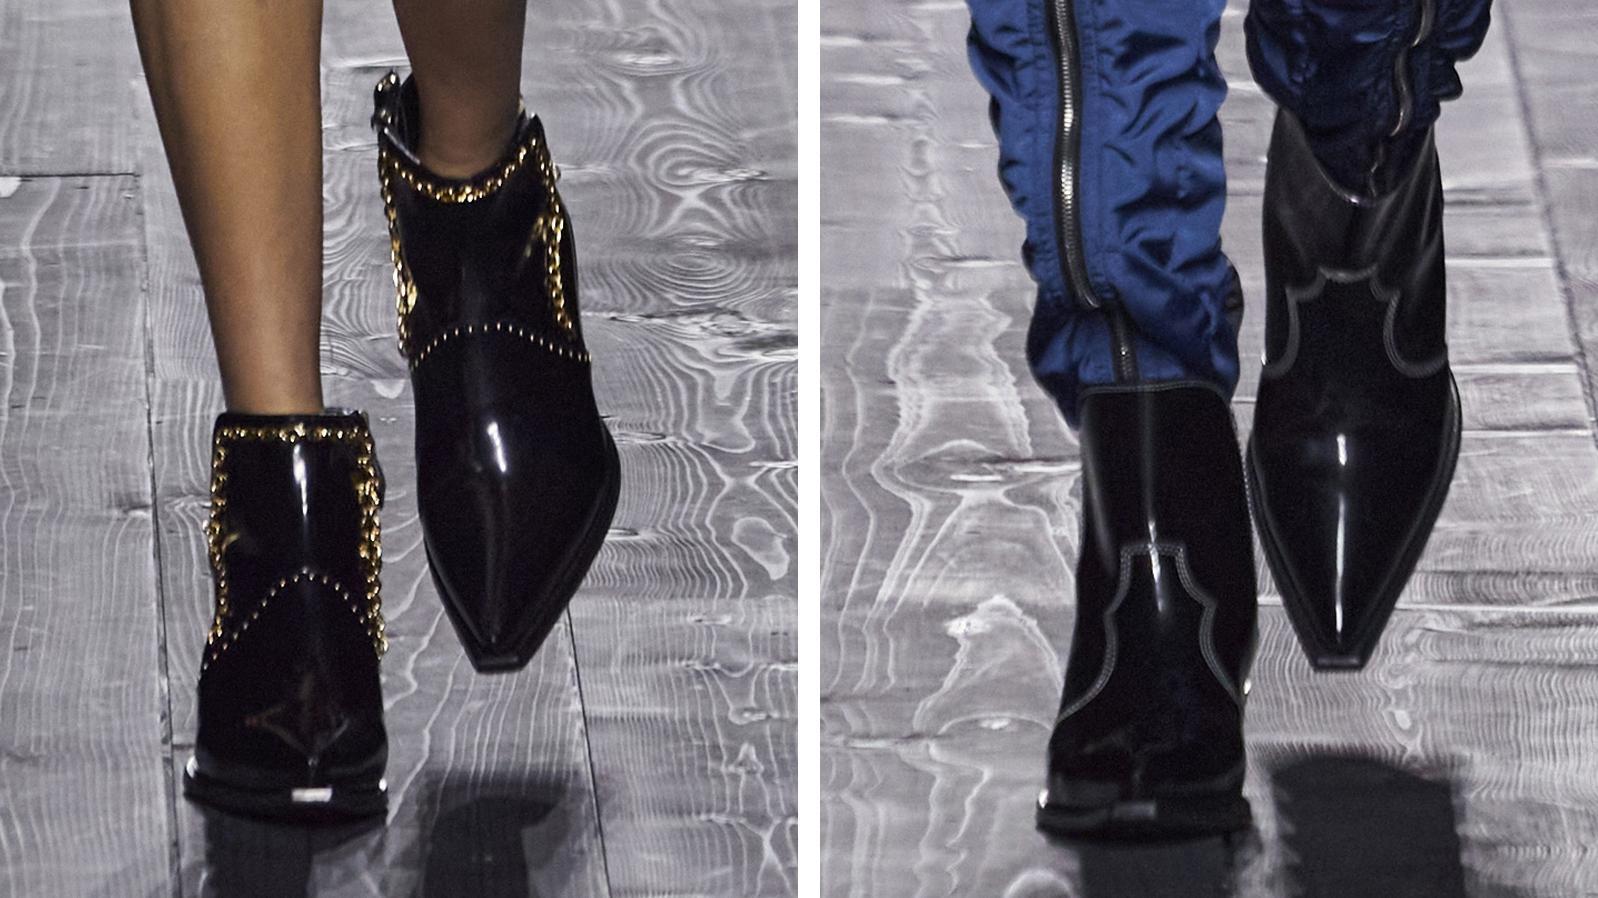 LV、Valentino、Dior 、Chloé潮鞋上市,太好看!网友:钱不够了